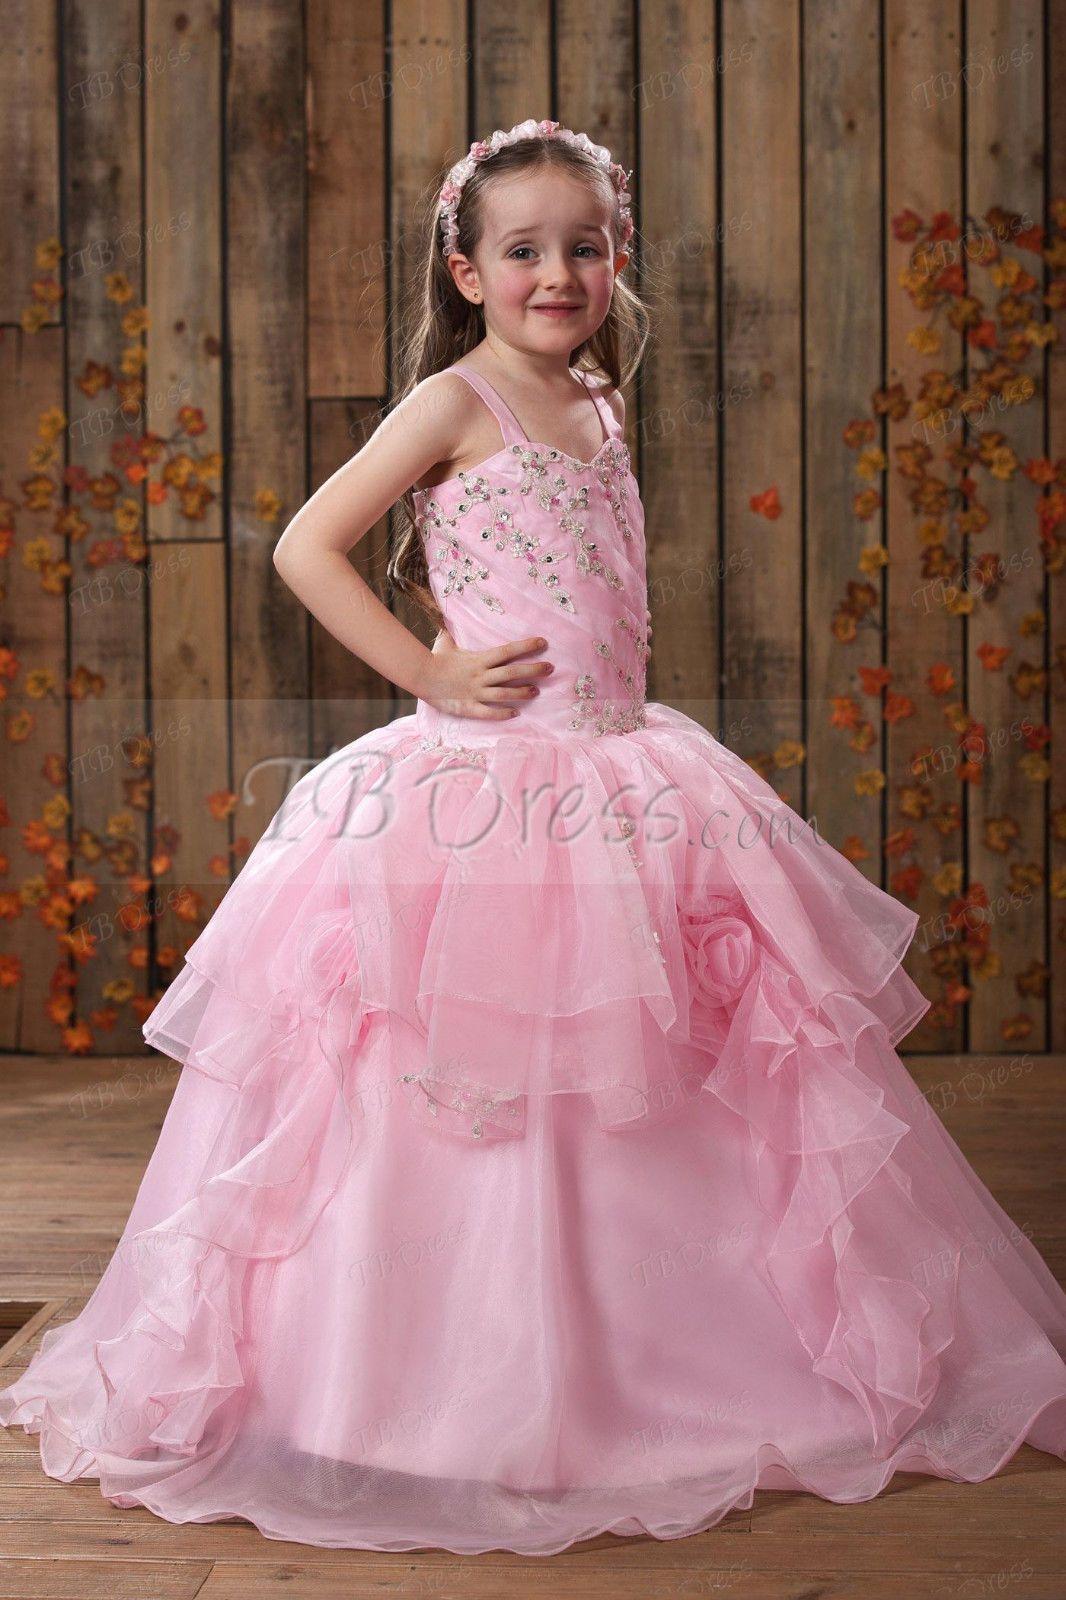 Blush Pink Wedding Flower Girl Dresses Puffy Tutu Kids Ball Gowns Floor Length Pageant Dresses For Girls Handmade Flowers Bateau Neck 2017